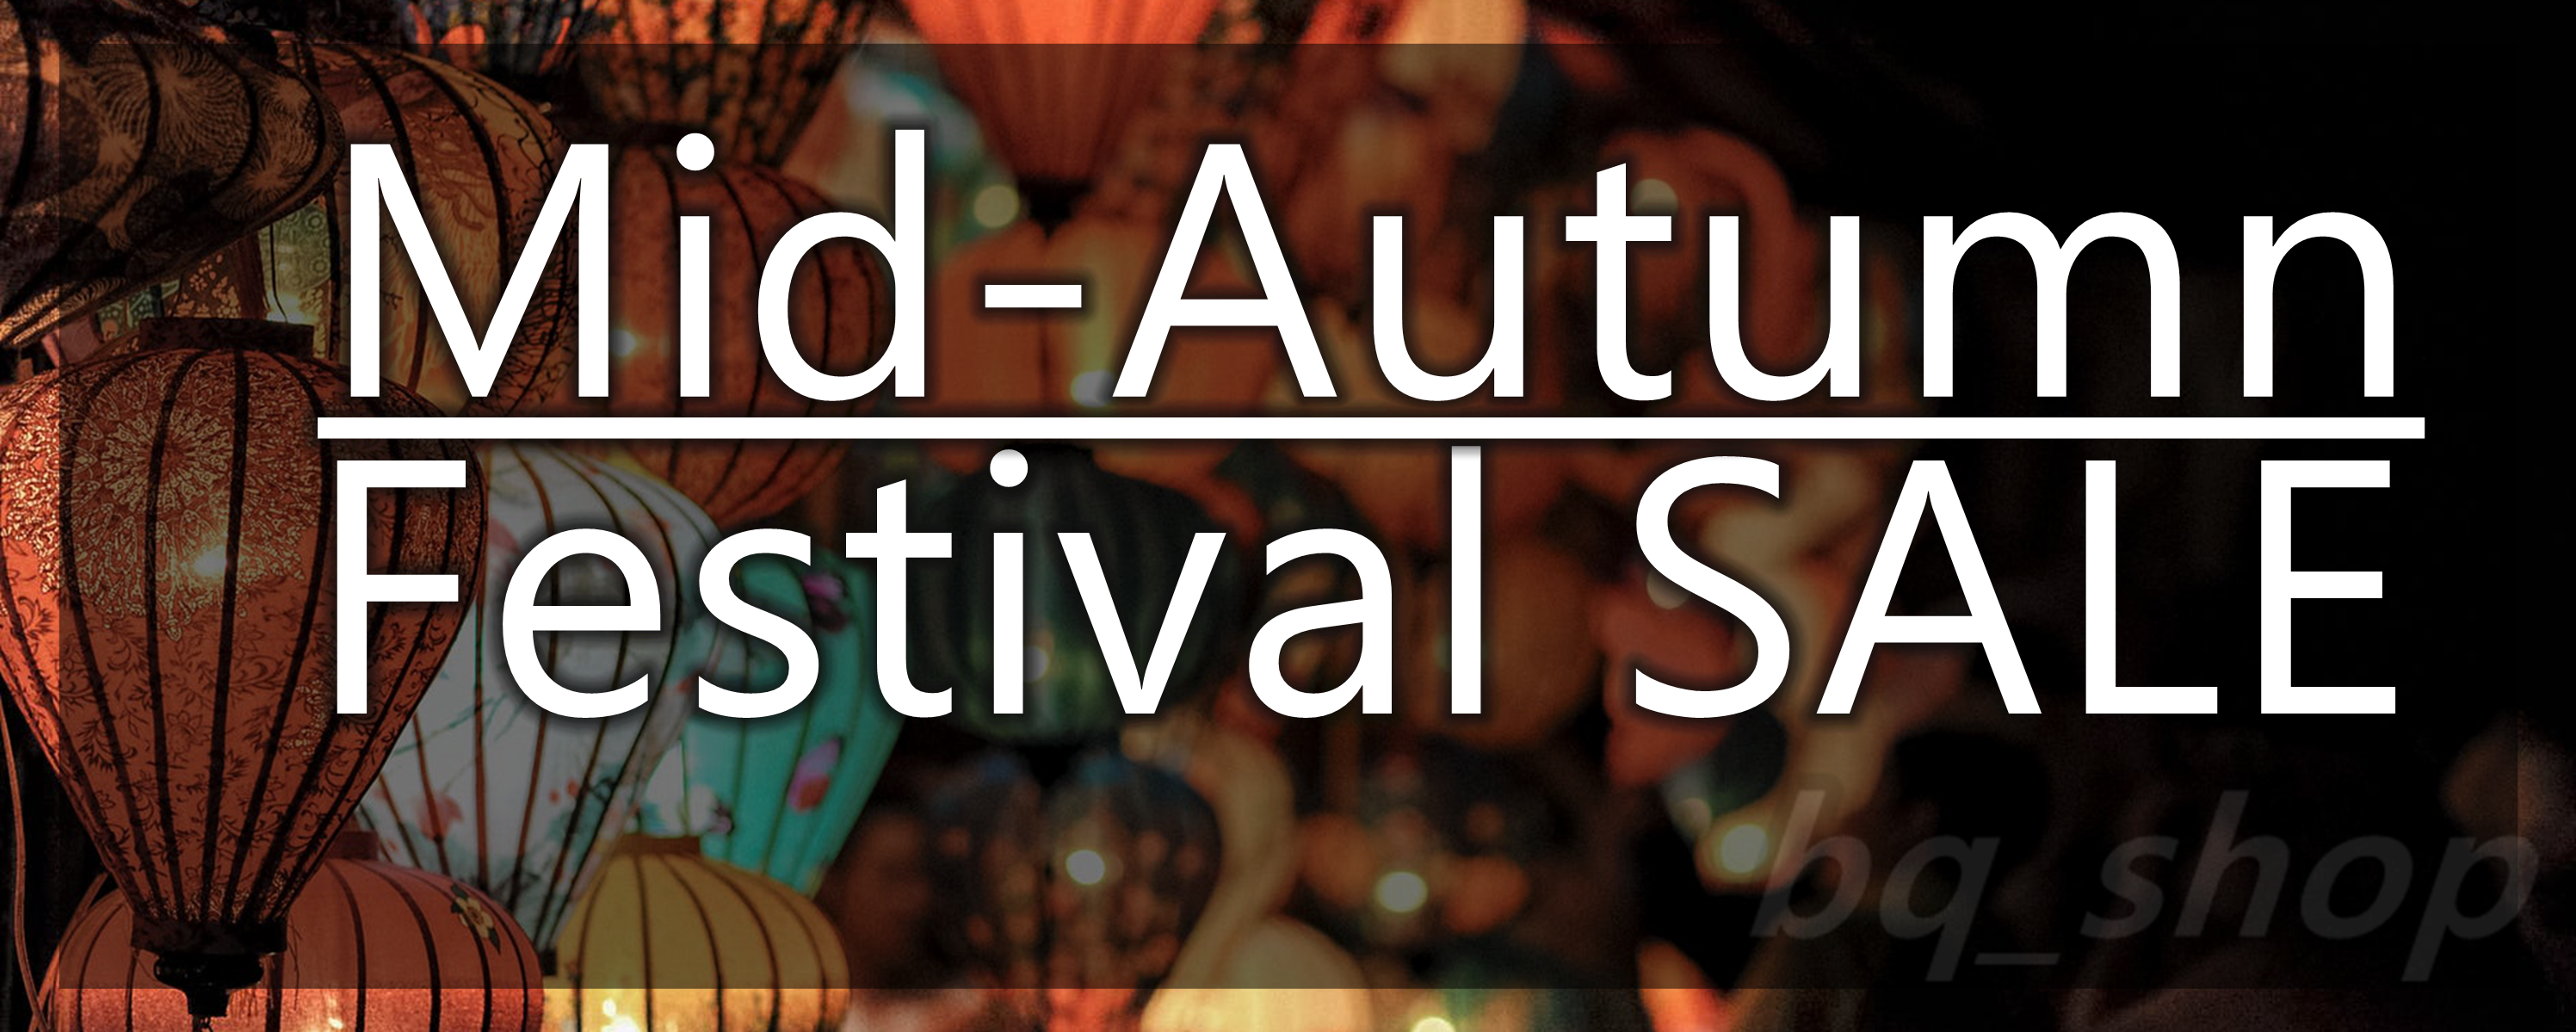 homepagecarousel-mid-autumnfestivalsale2018-bqshopestore.com-1.png